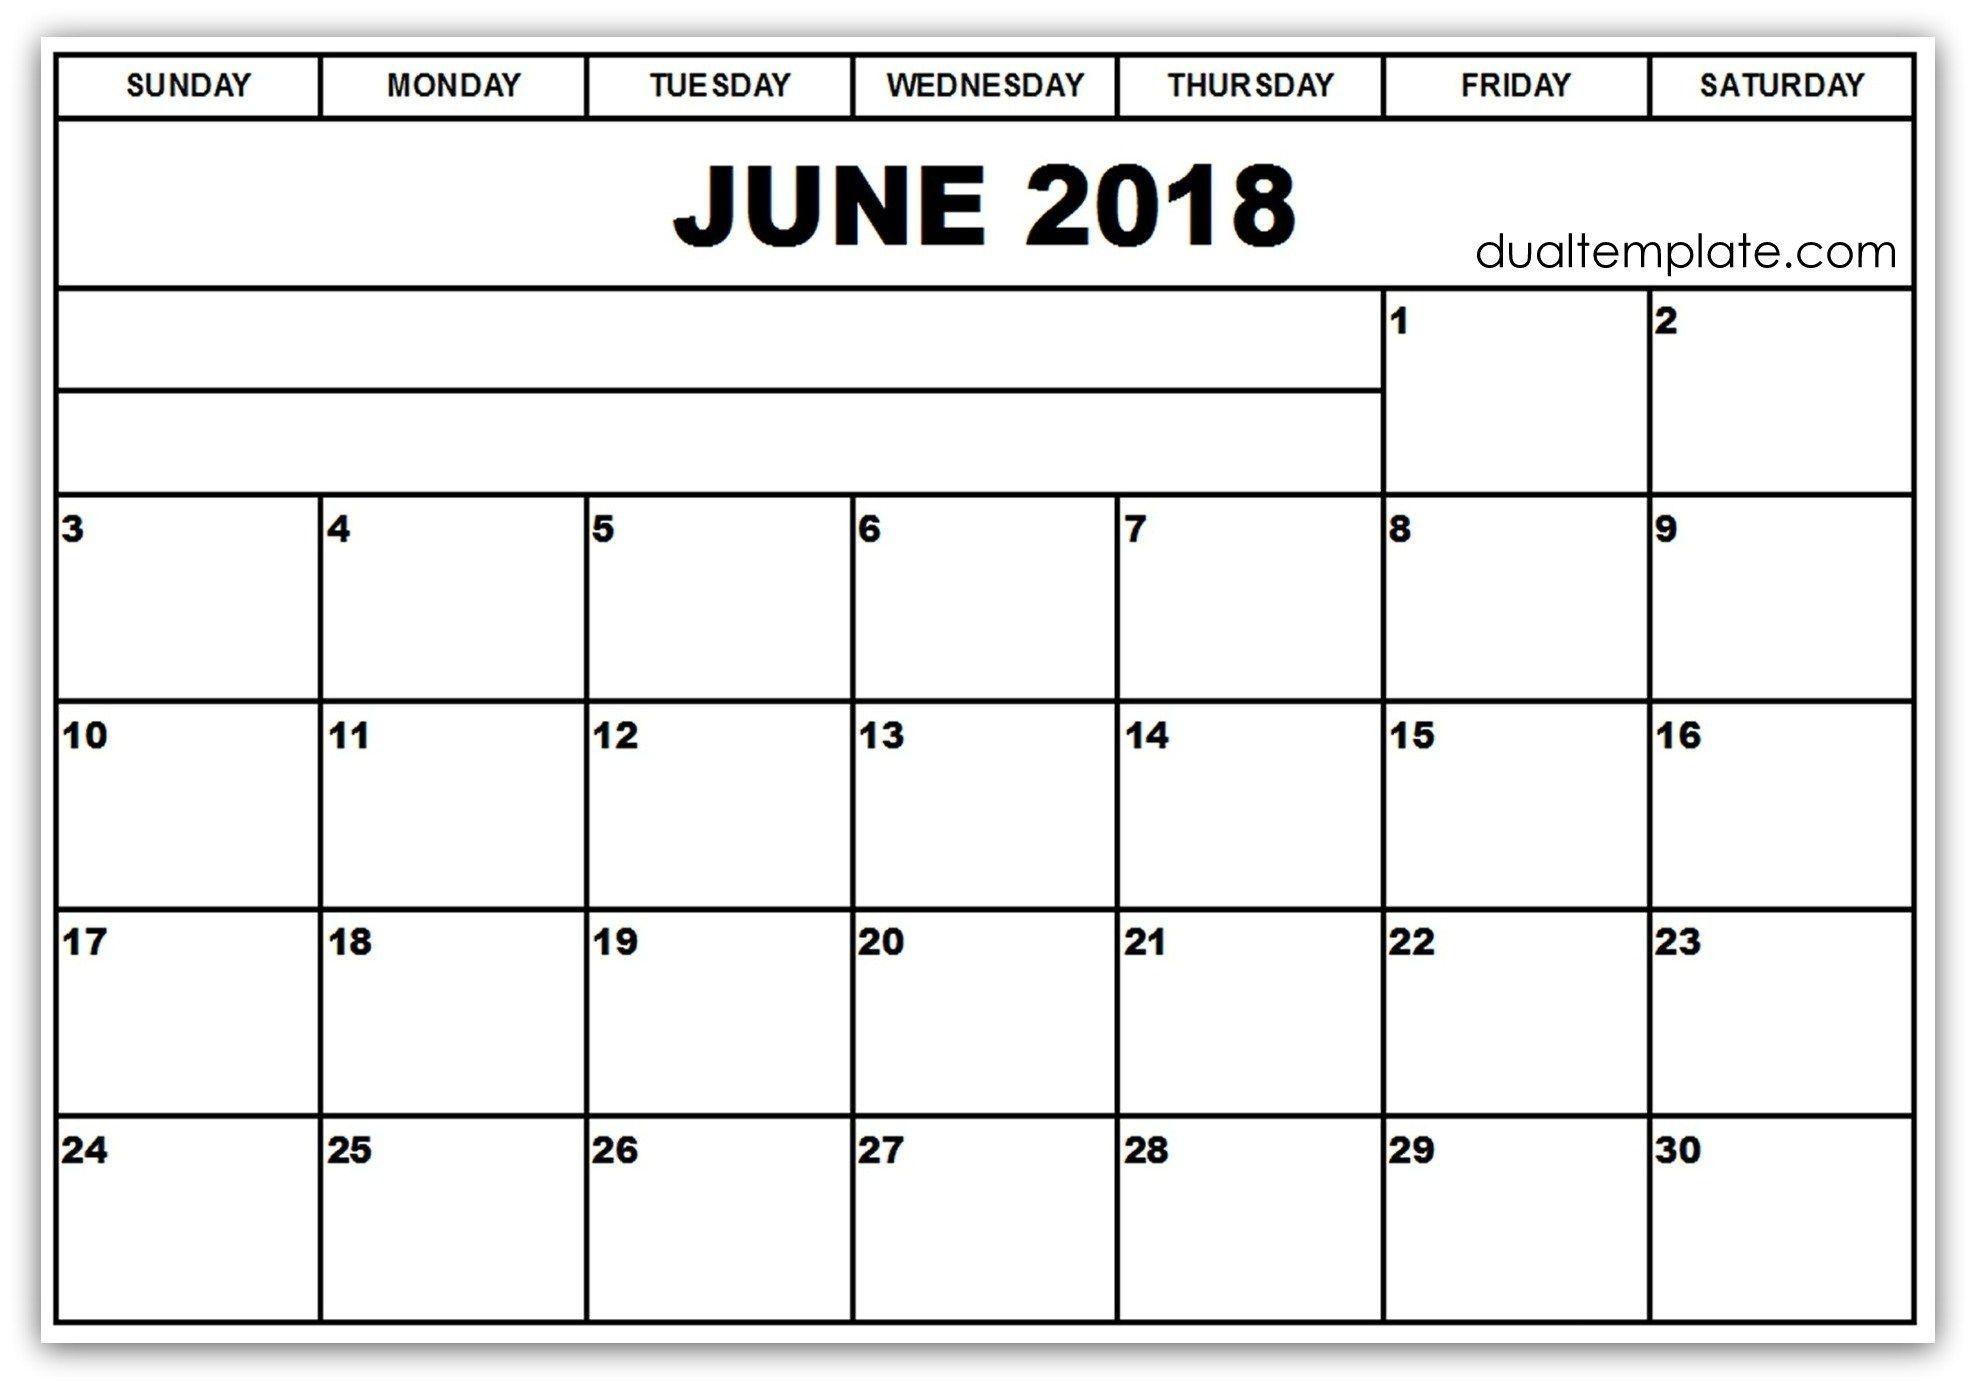 Pick June 2019 With Julian Dates Calendar Printables 2018